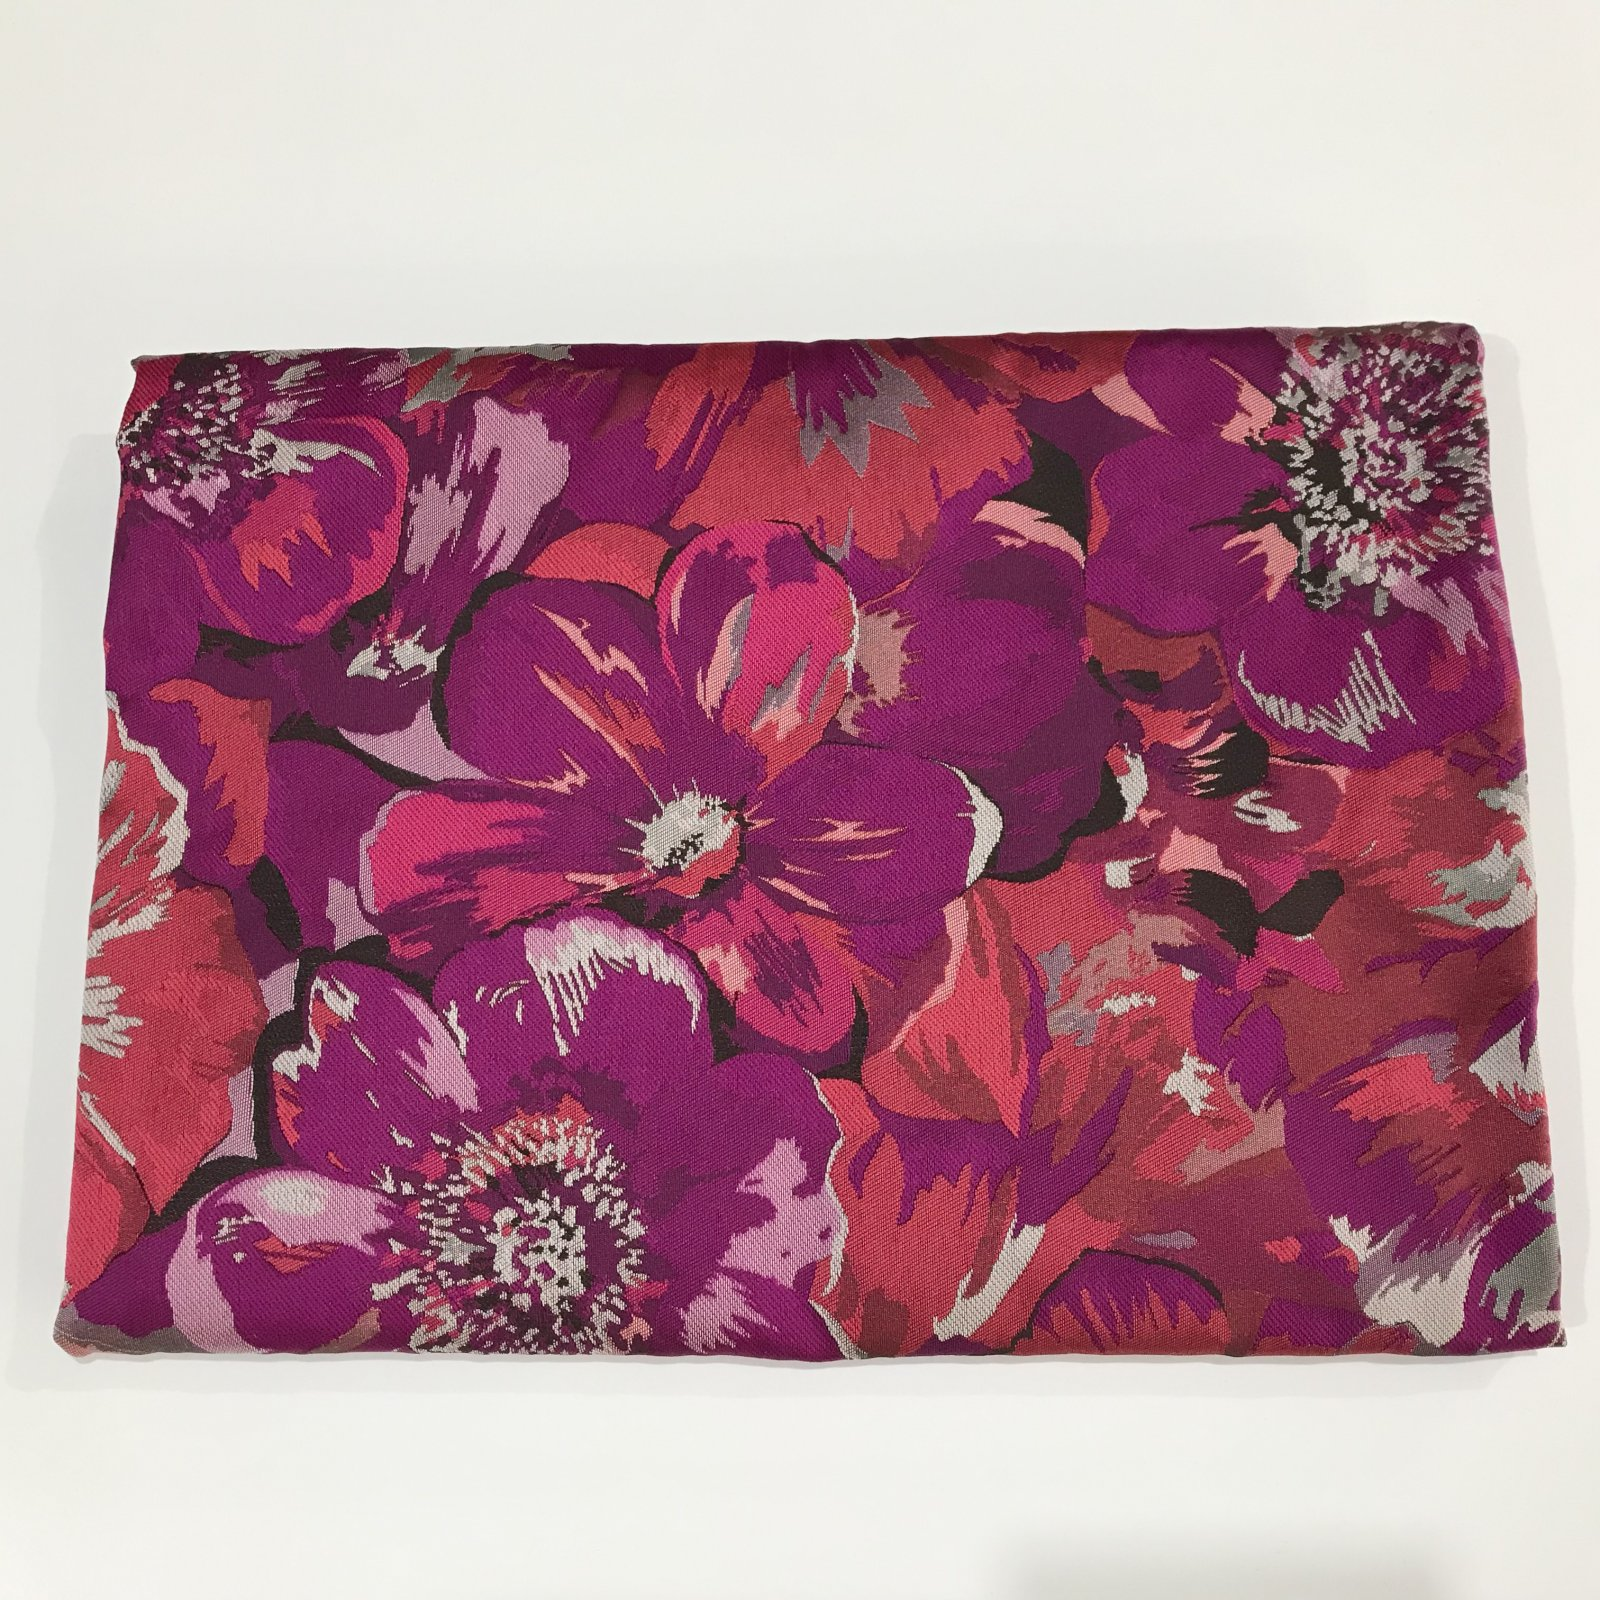 1 yard - Floral Jacquard